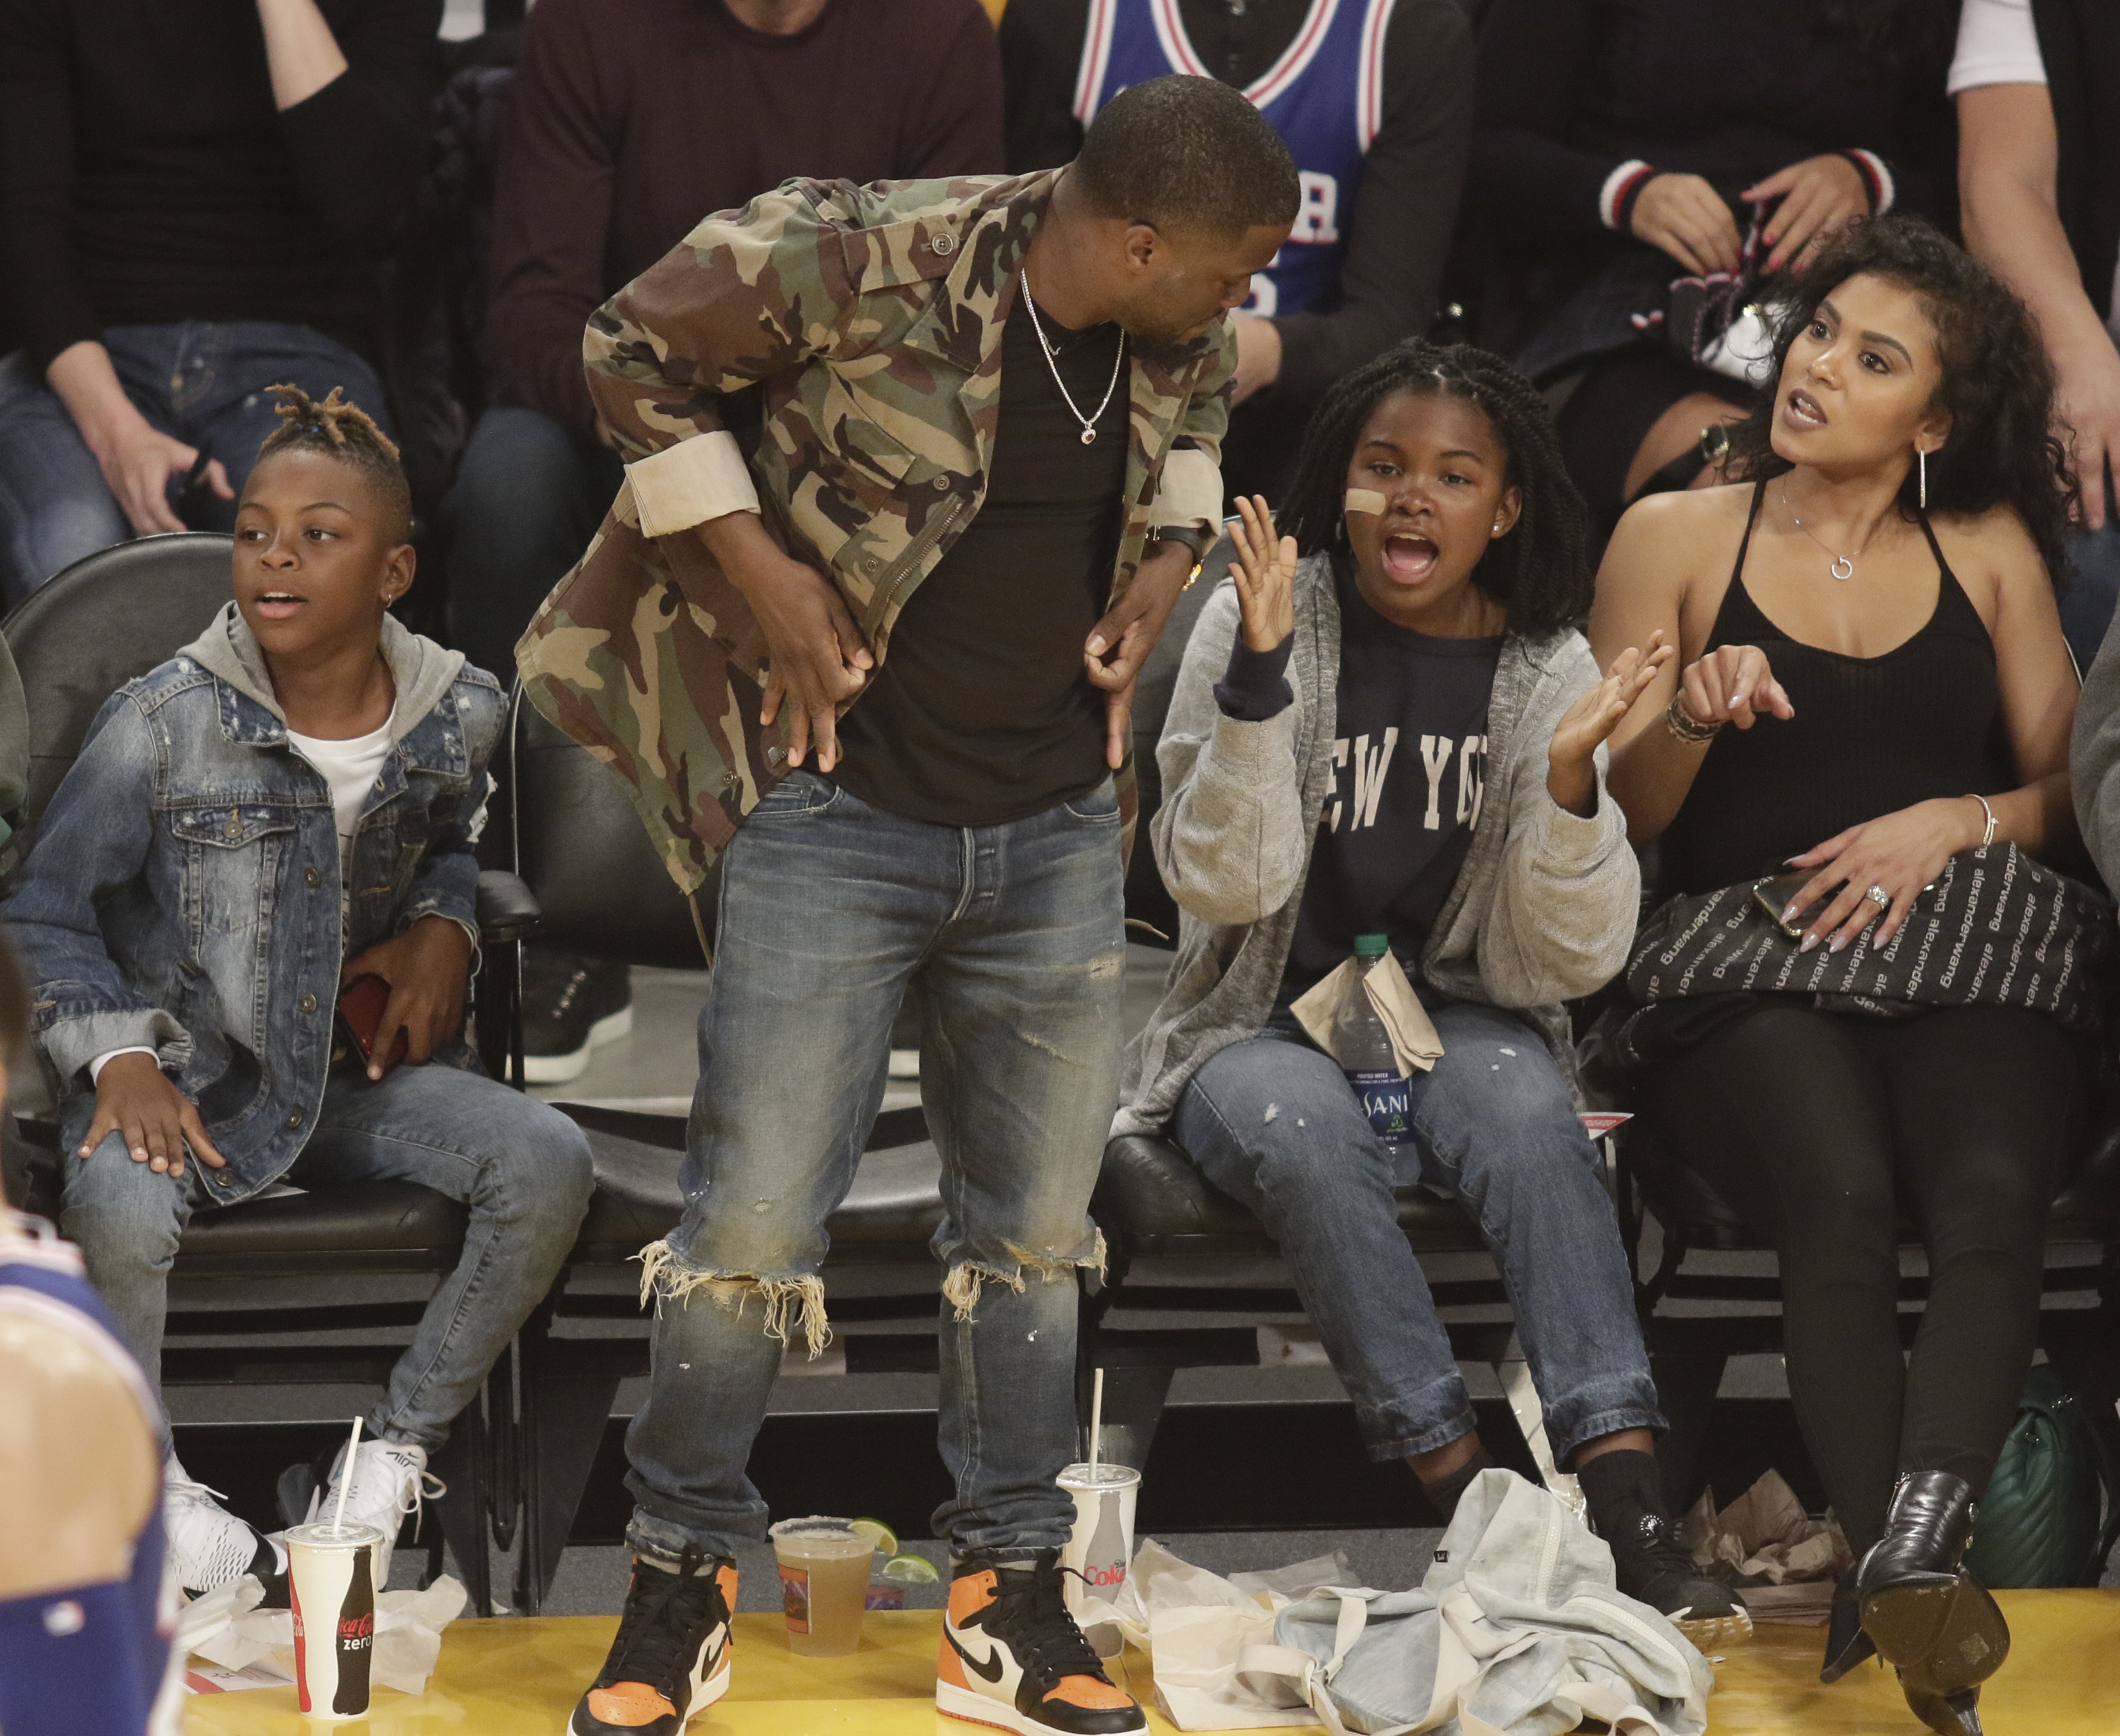 Celebrities Attend Los Angeles Lakers vs Philadelphia 76ers game